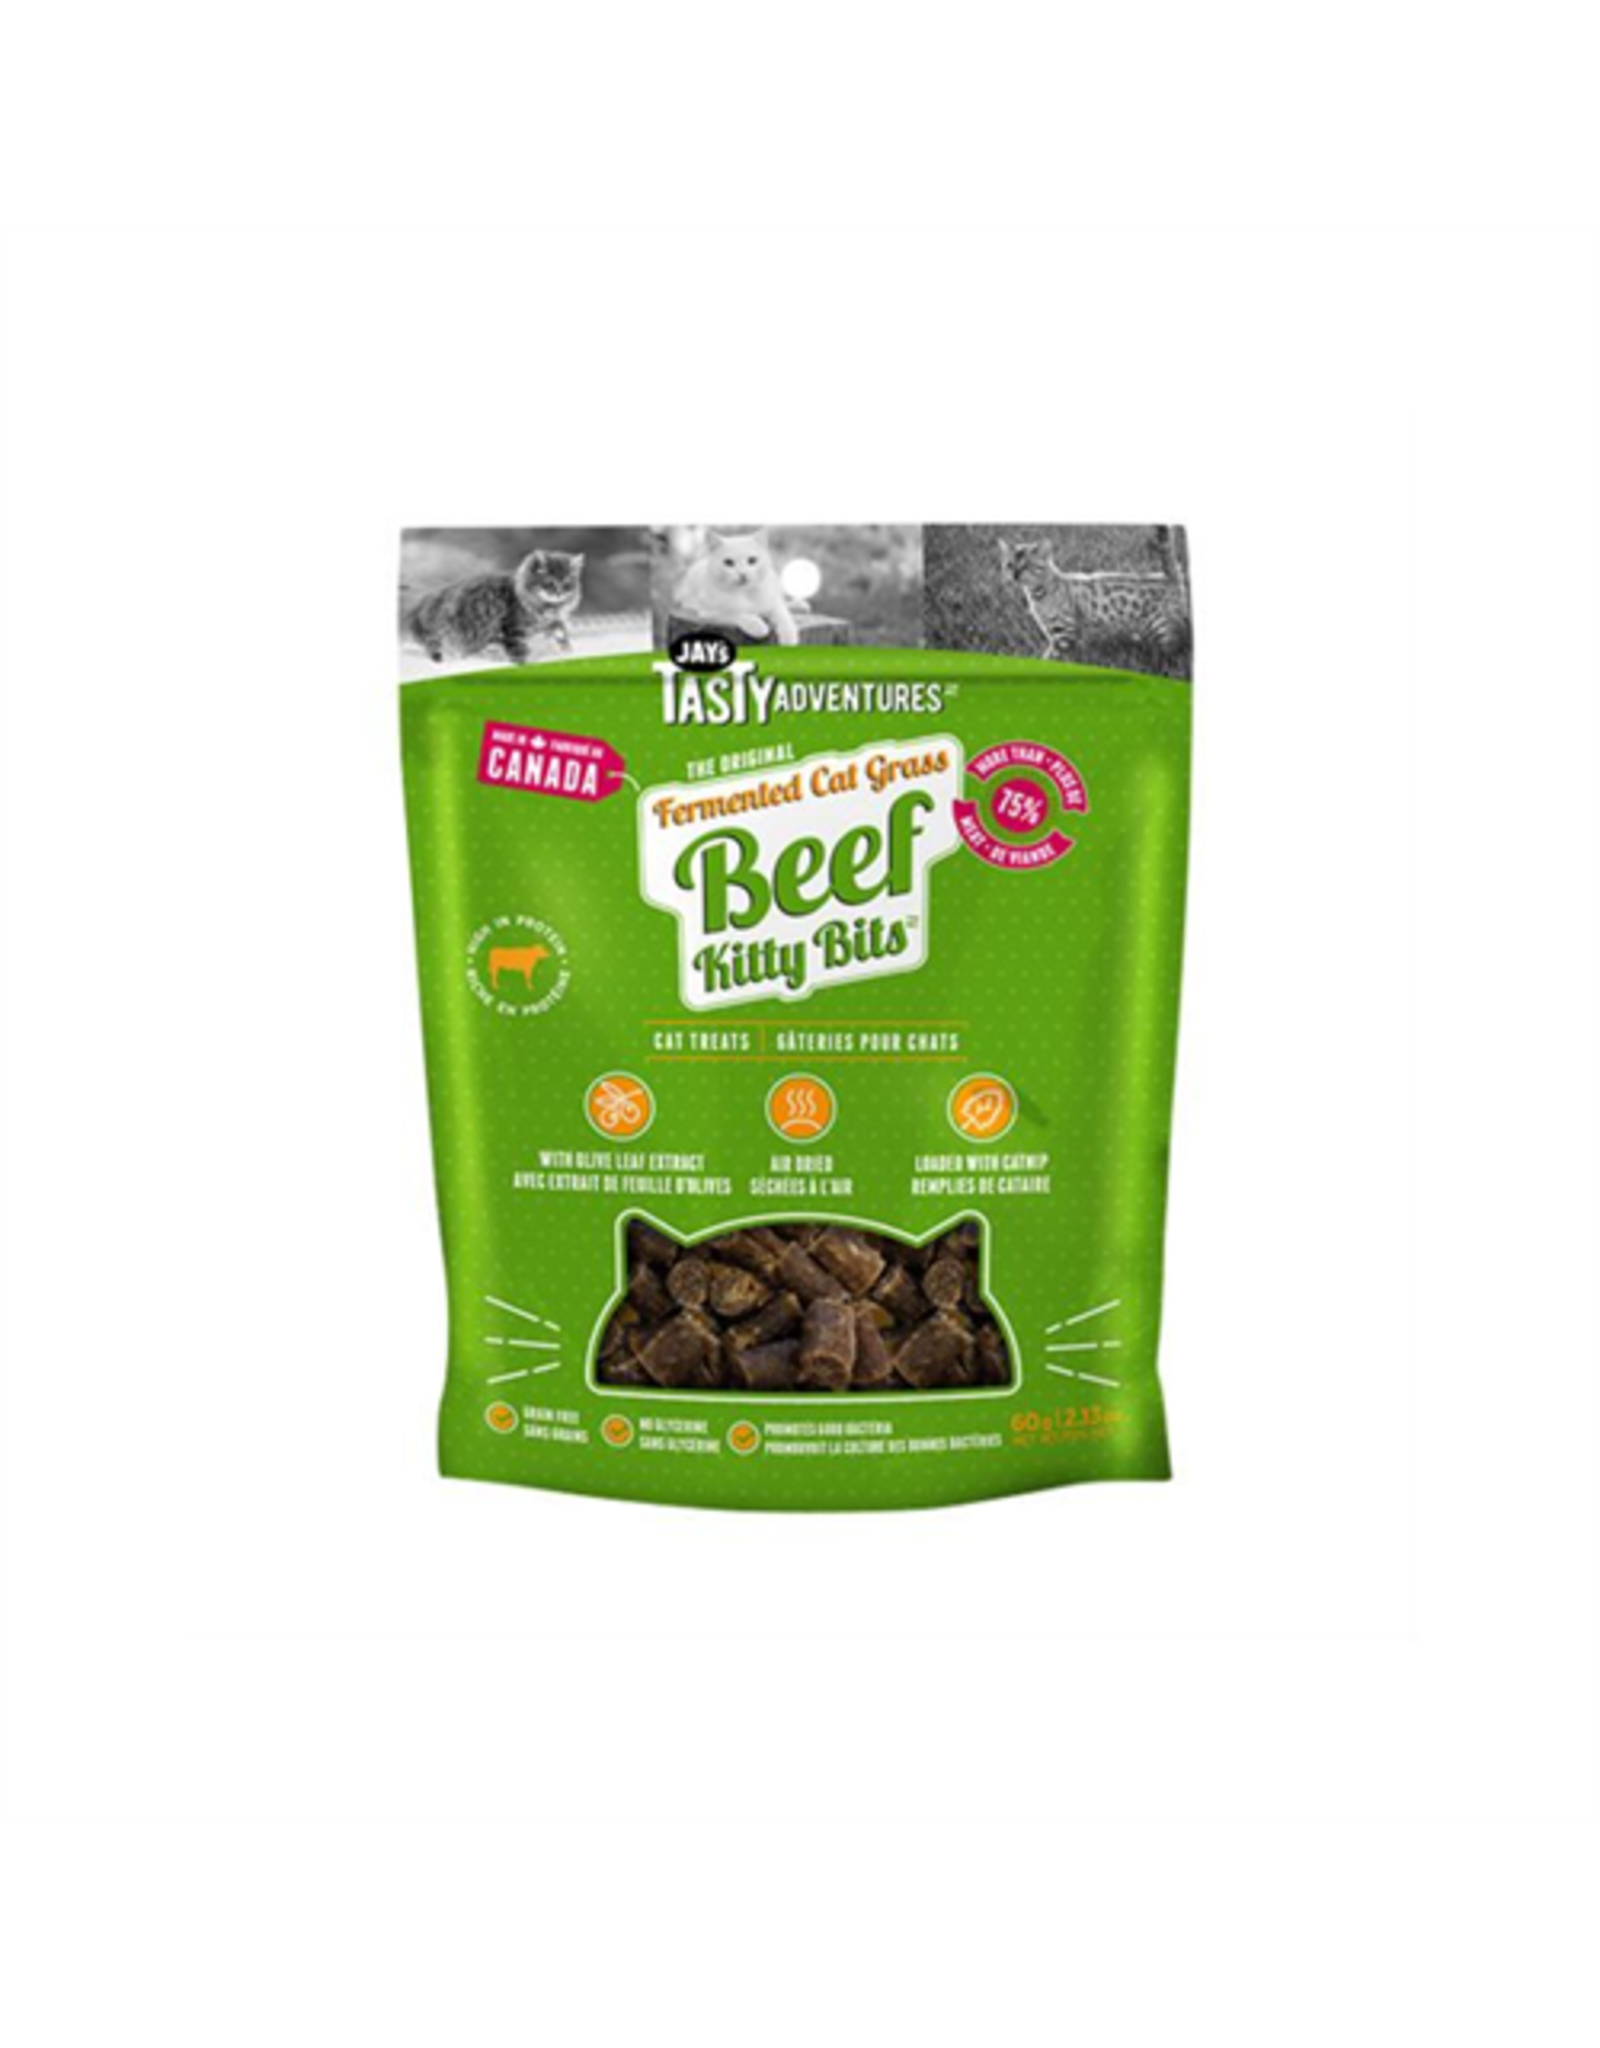 Jay's Tasty Adventures Jays Fermented Cat Grass Beef Cat Treats 60g